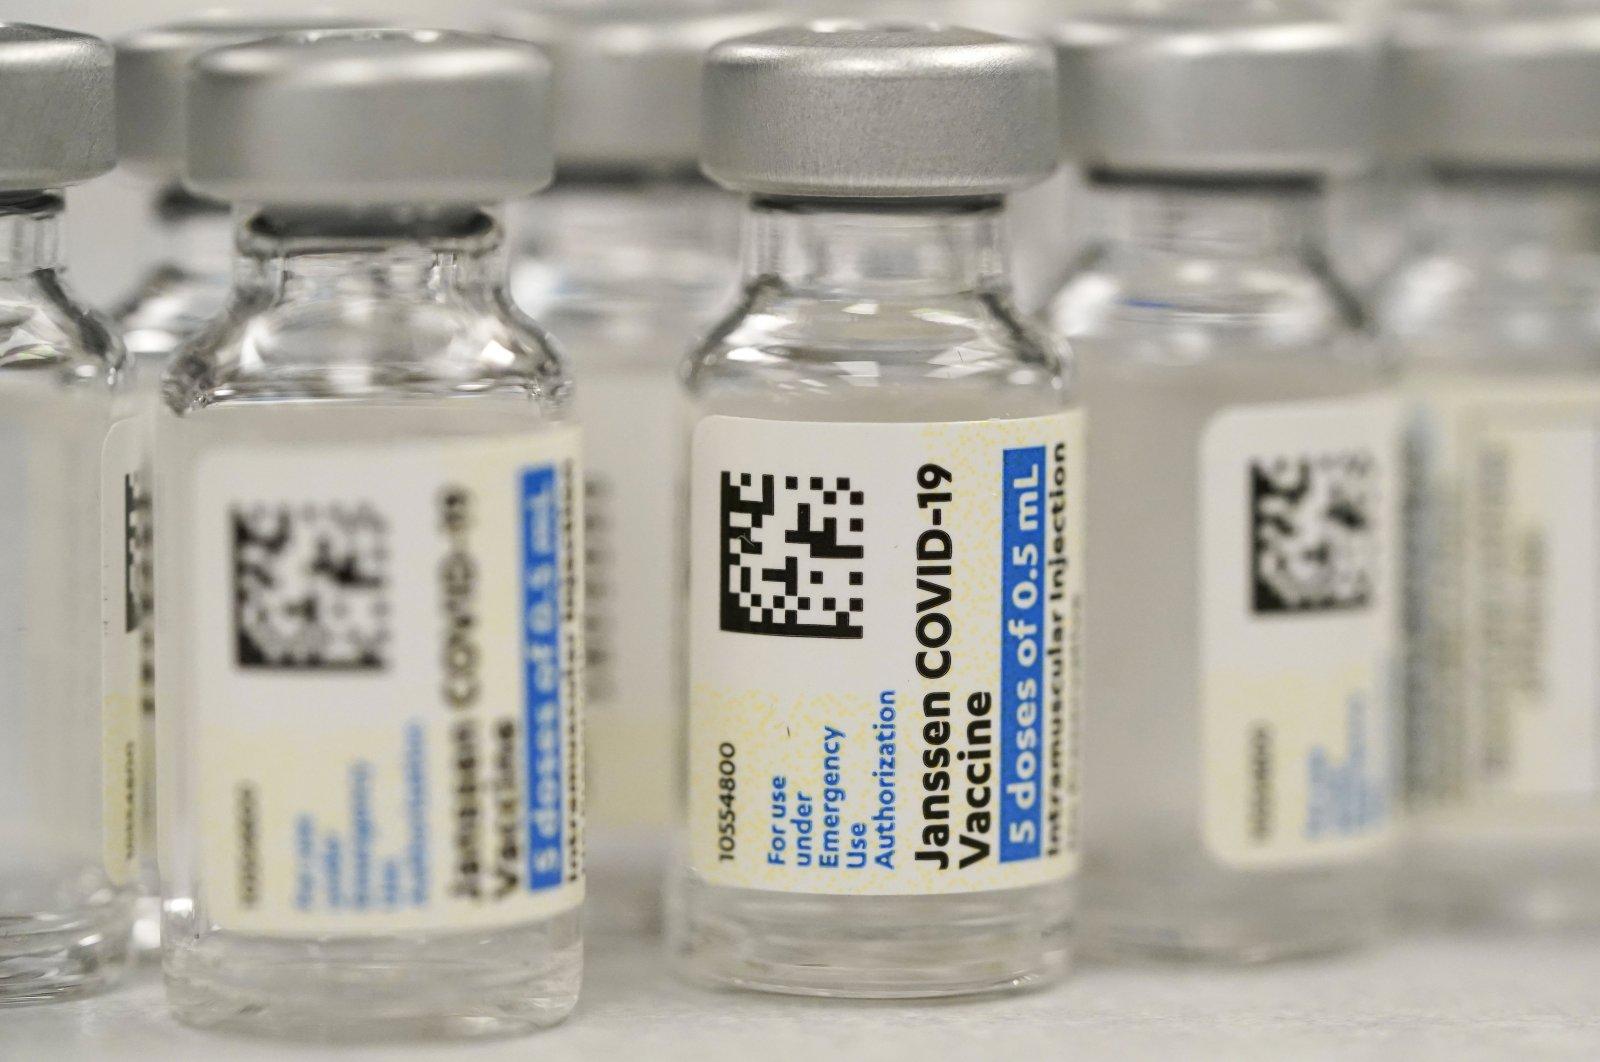 Vials of Johnson & Johnson COVID-19 vaccine at a pharmacy in Denver, Colorado, U.S., March 6, 2021. (AP Photo)